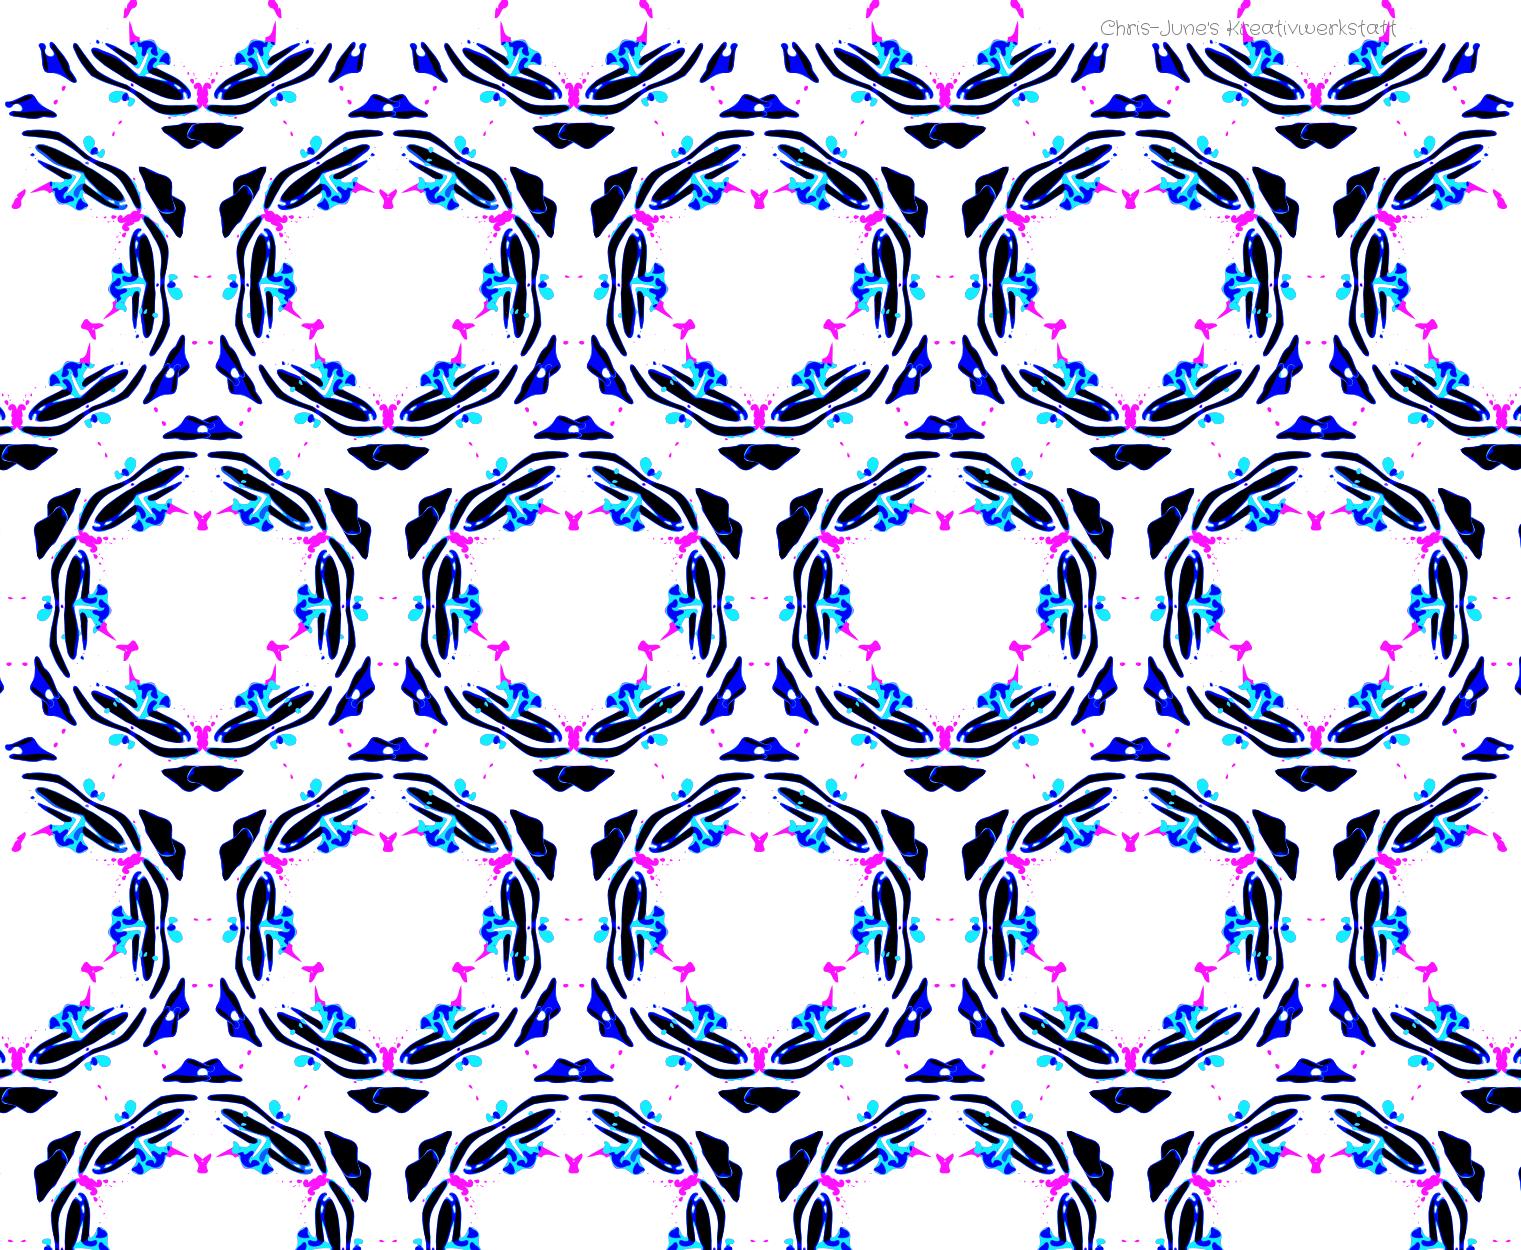 Schmetterlingsmuster schwarz/blau/türkis/pink